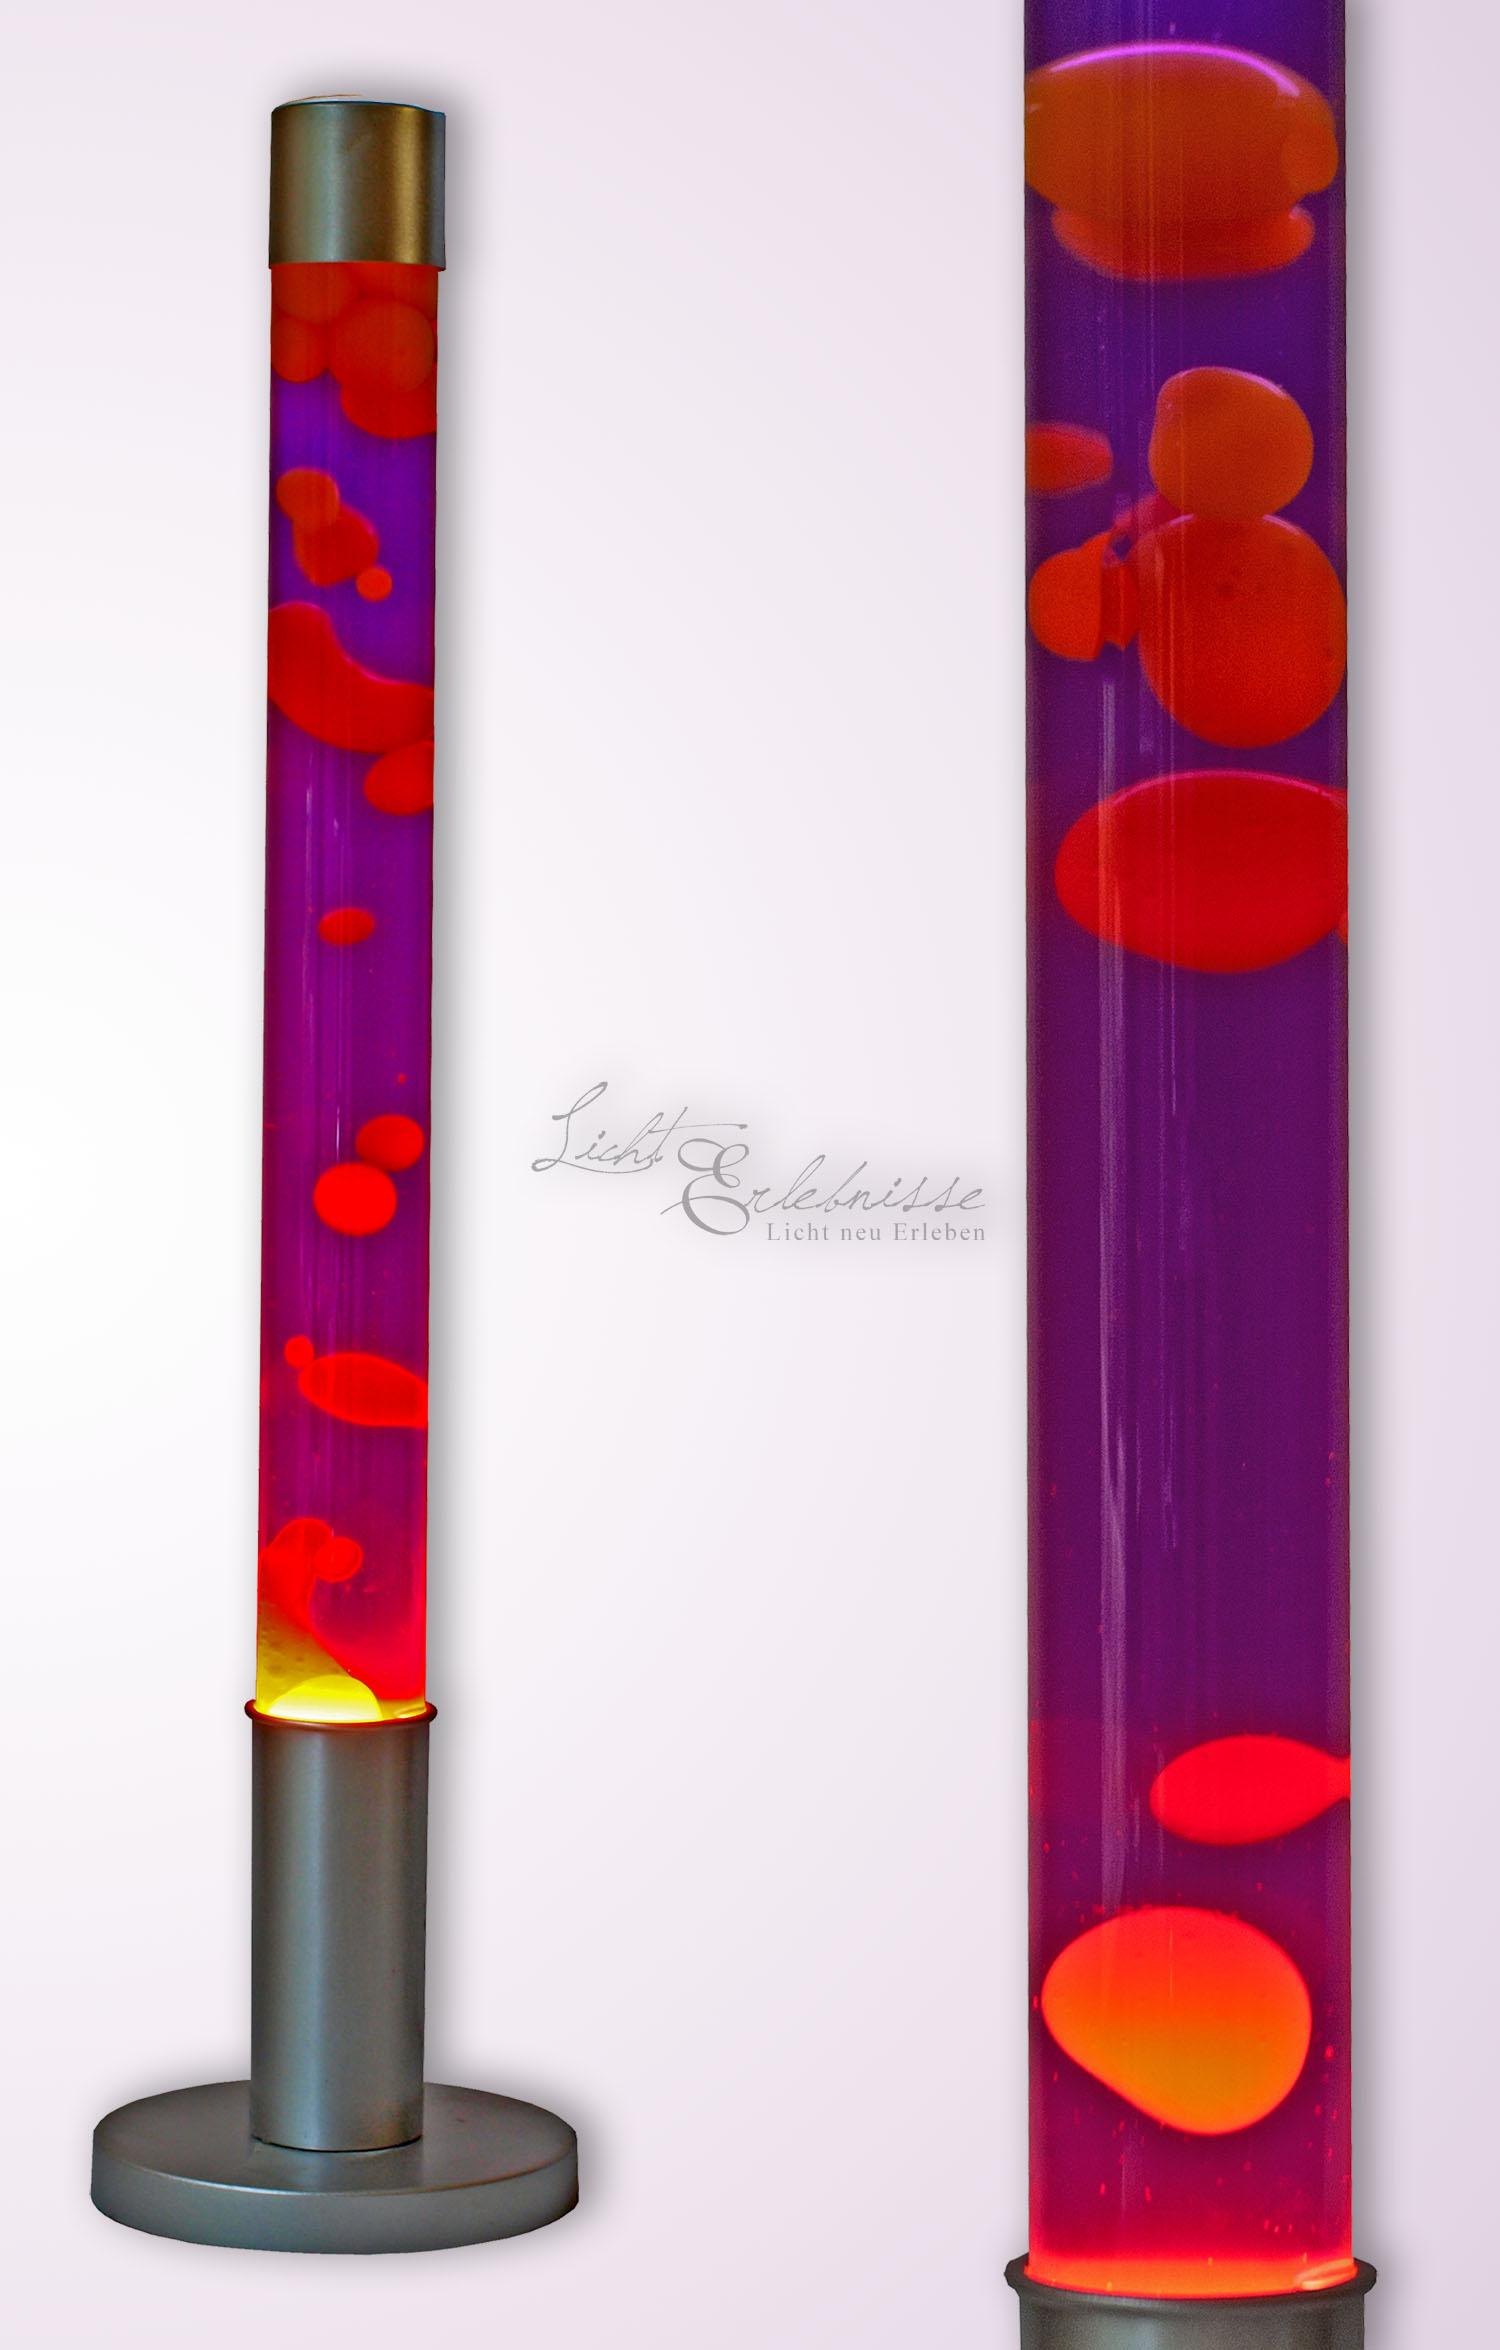 Retro Lavalampe Gelb Lila Silber 76cm hoch DOVCE